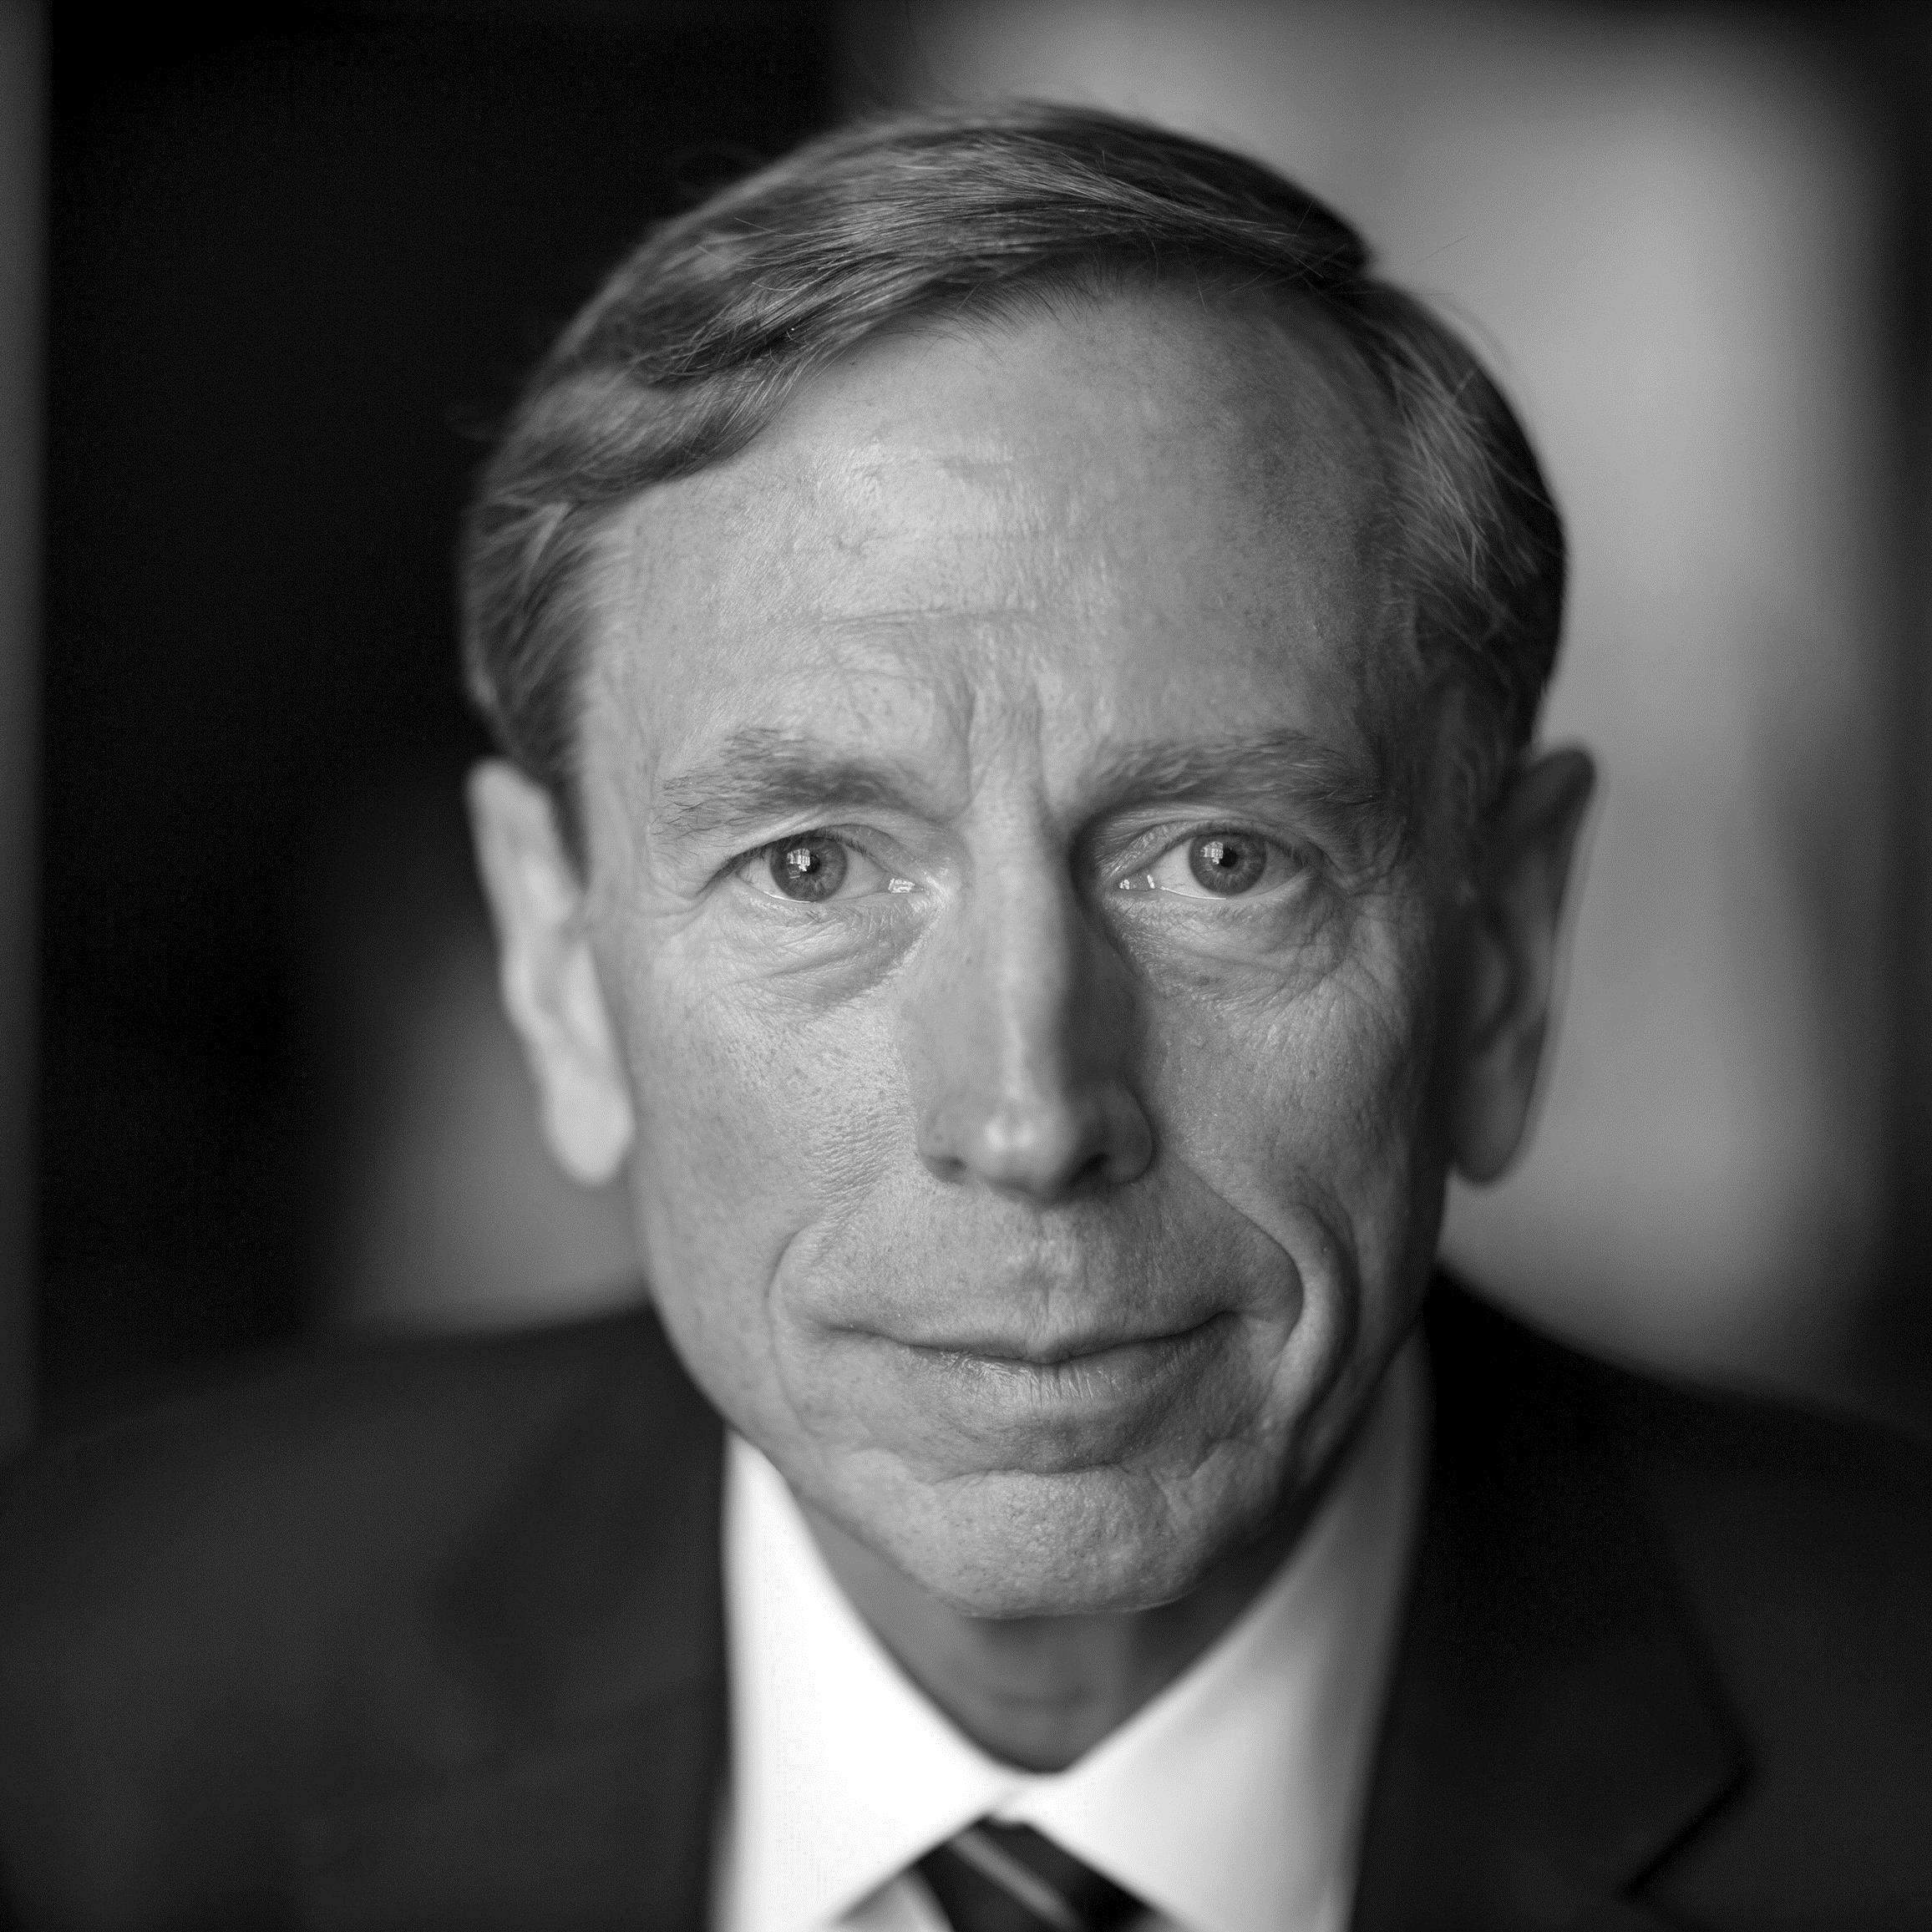 Petraeus-David-PHOTO-B&W.jpg